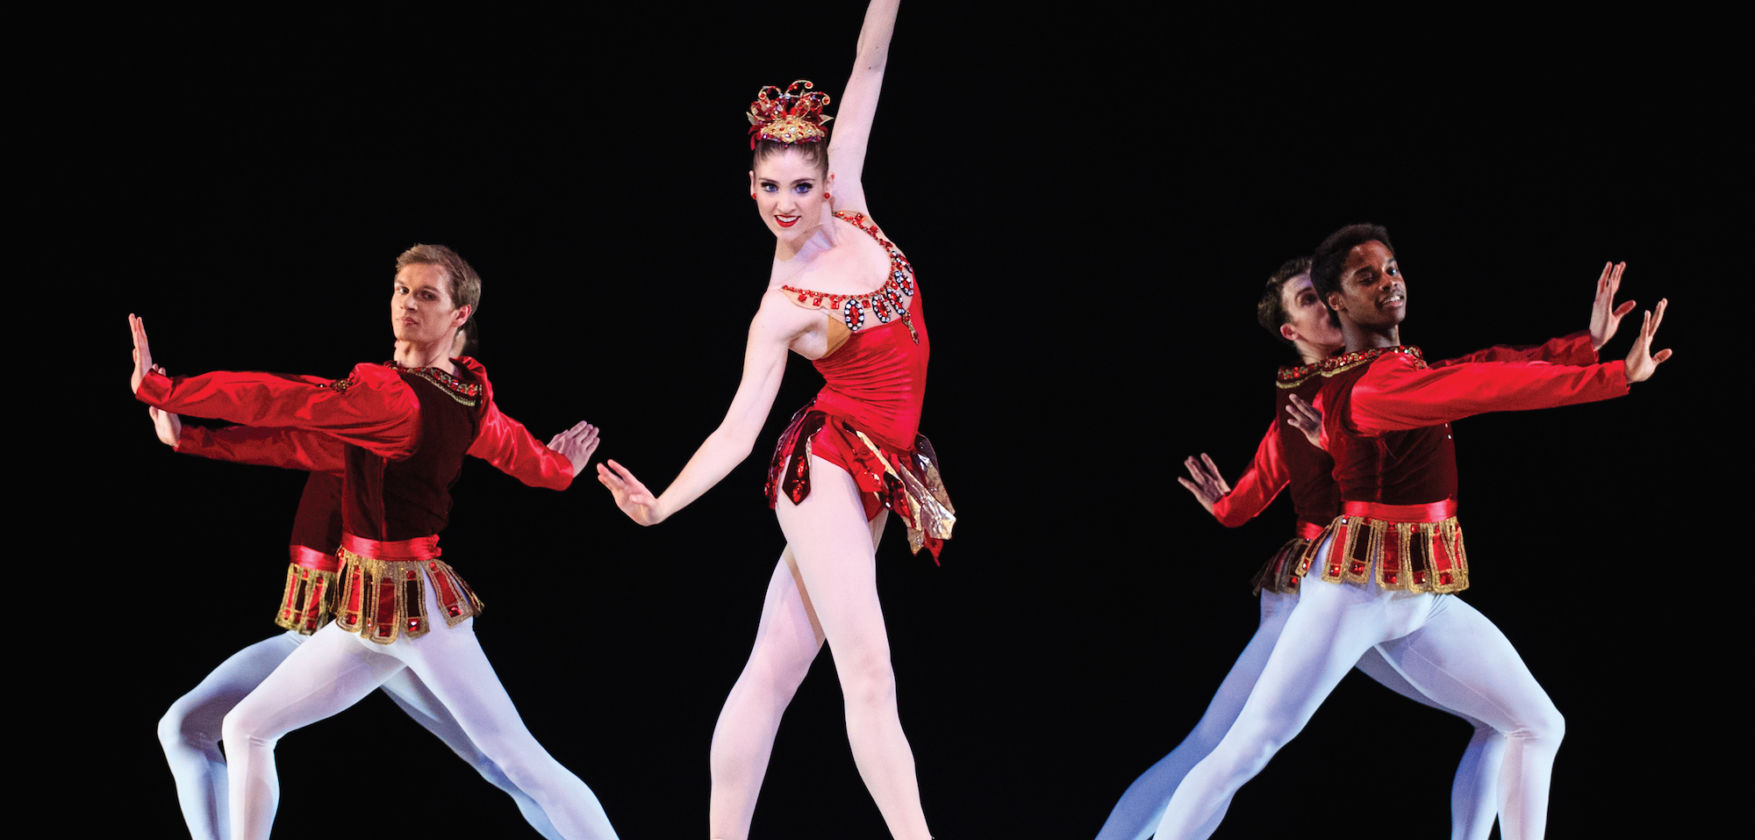 Ballet West in Rubies. Dancer: Emily Adams. Photo: Luke Isley